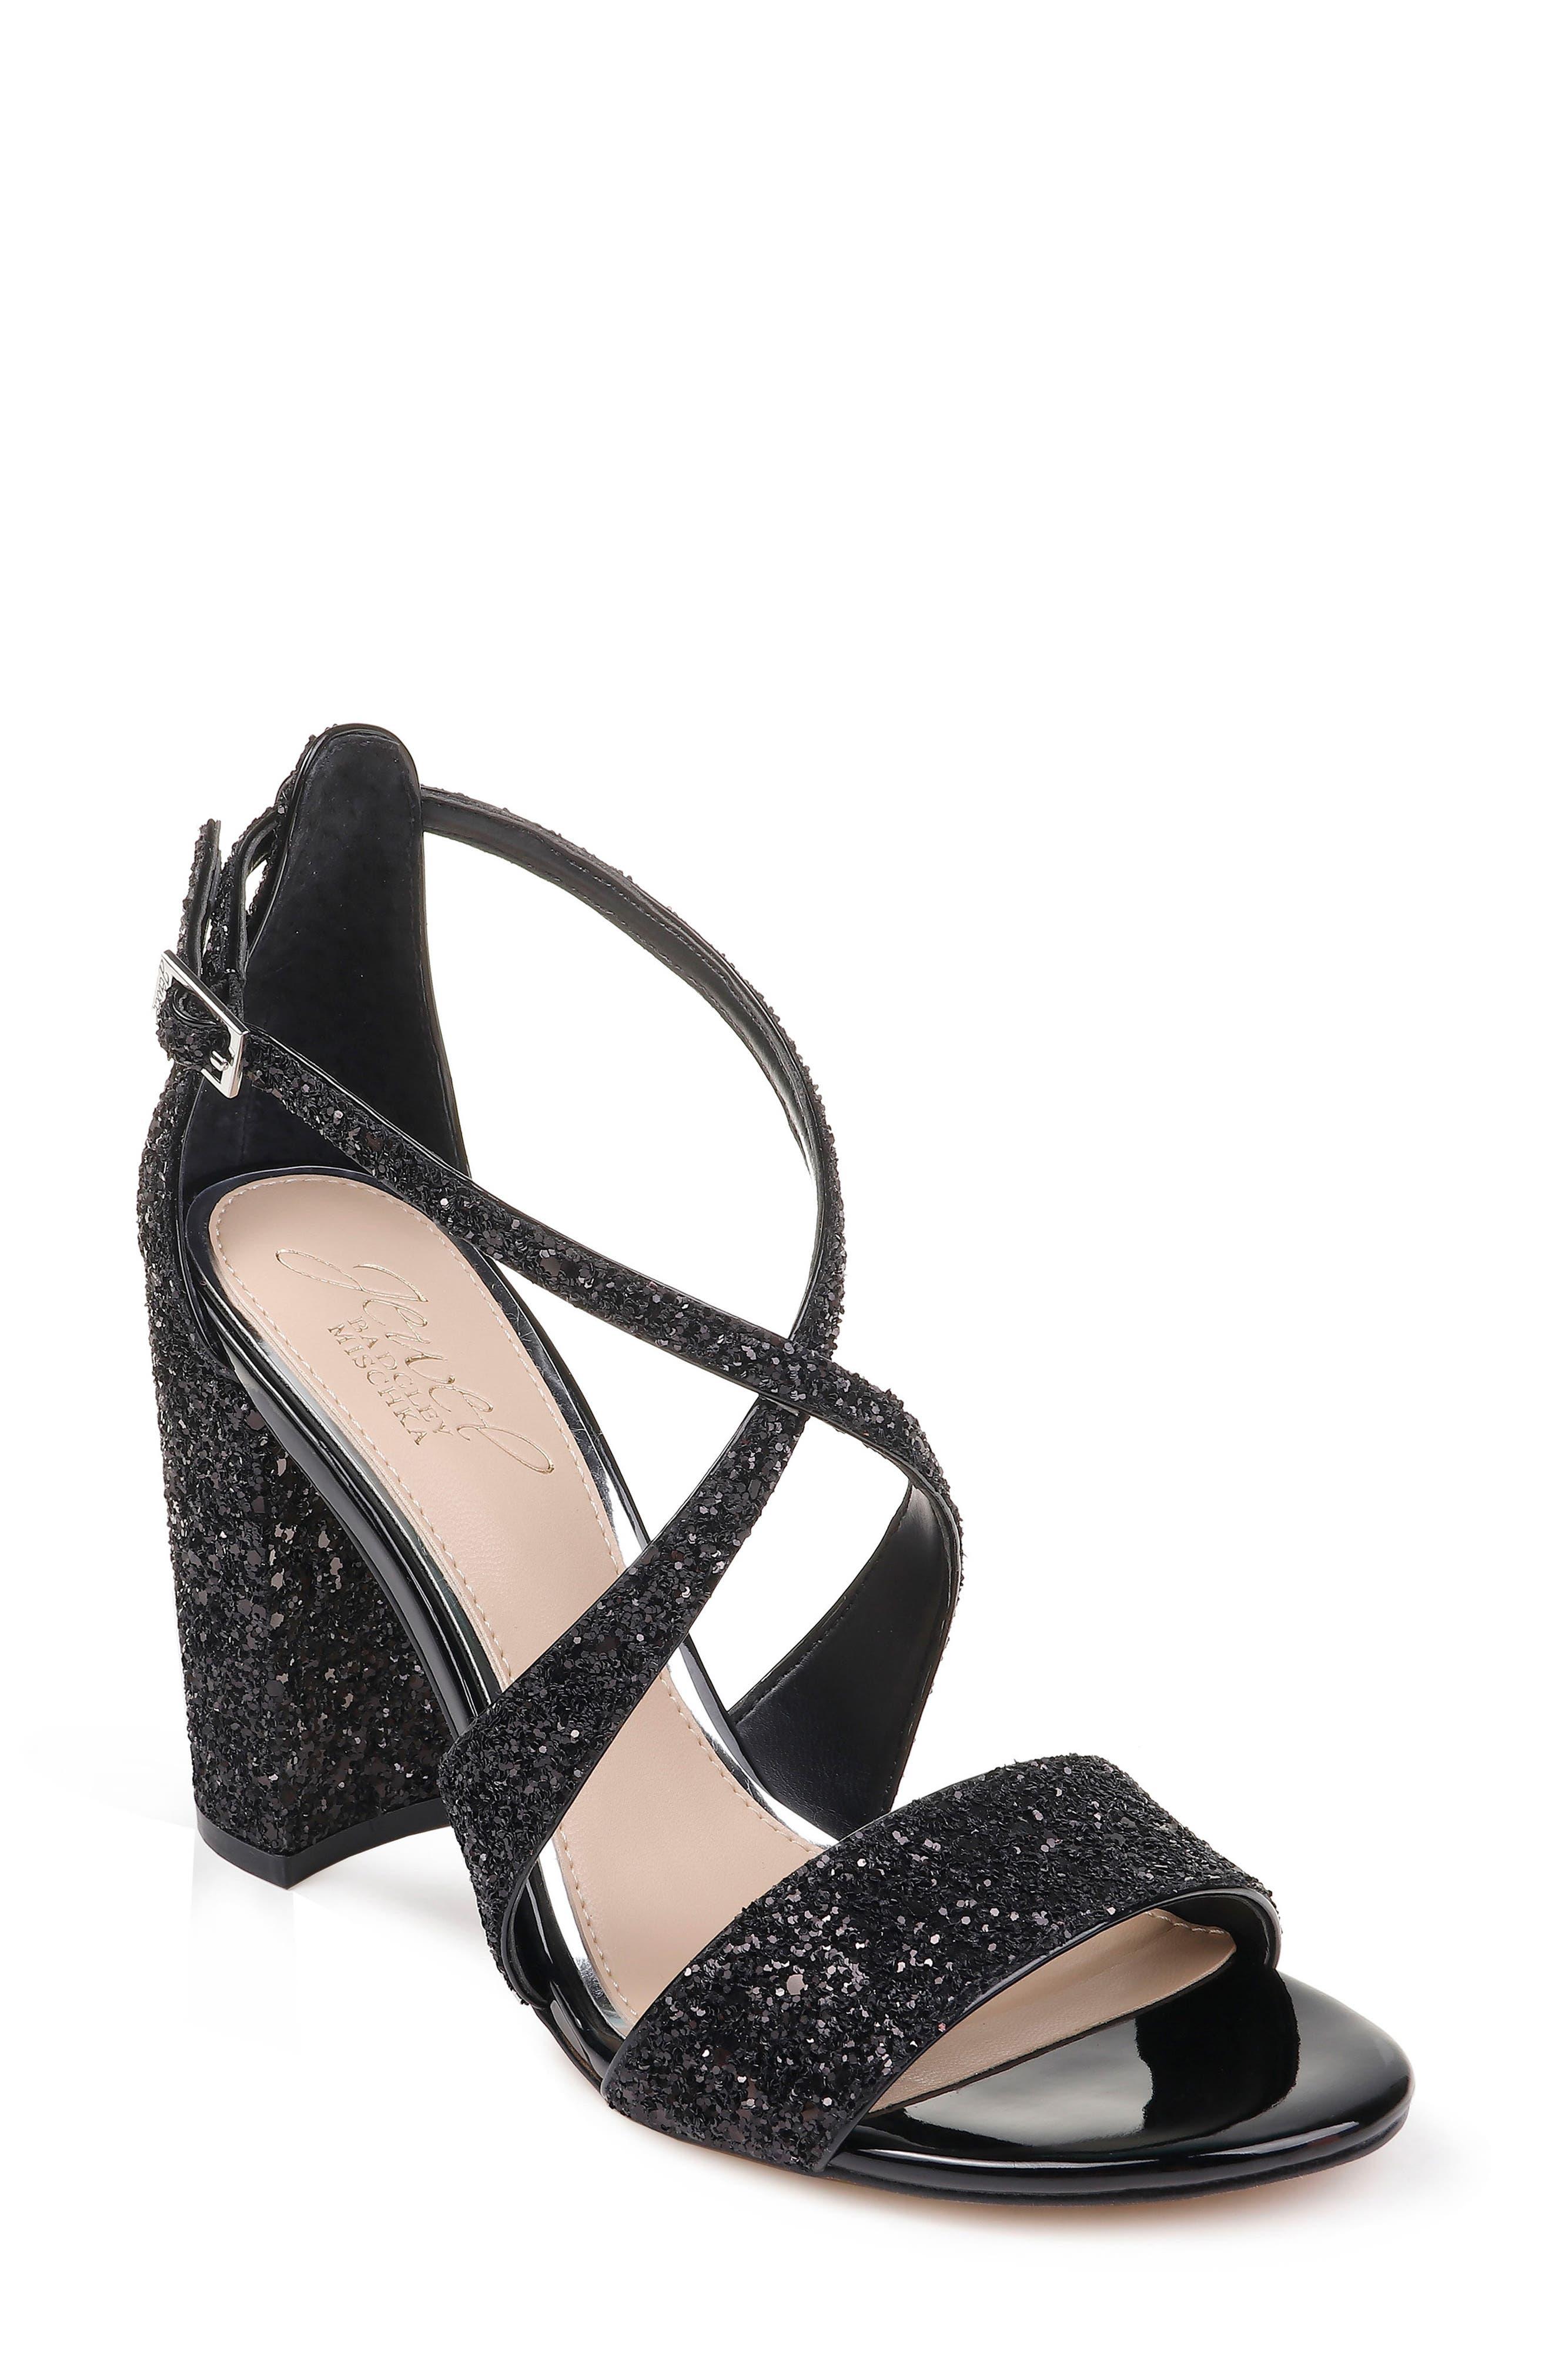 Cook Block Heel Glitter Sandal,                             Main thumbnail 1, color,                             BLACK LEATHER